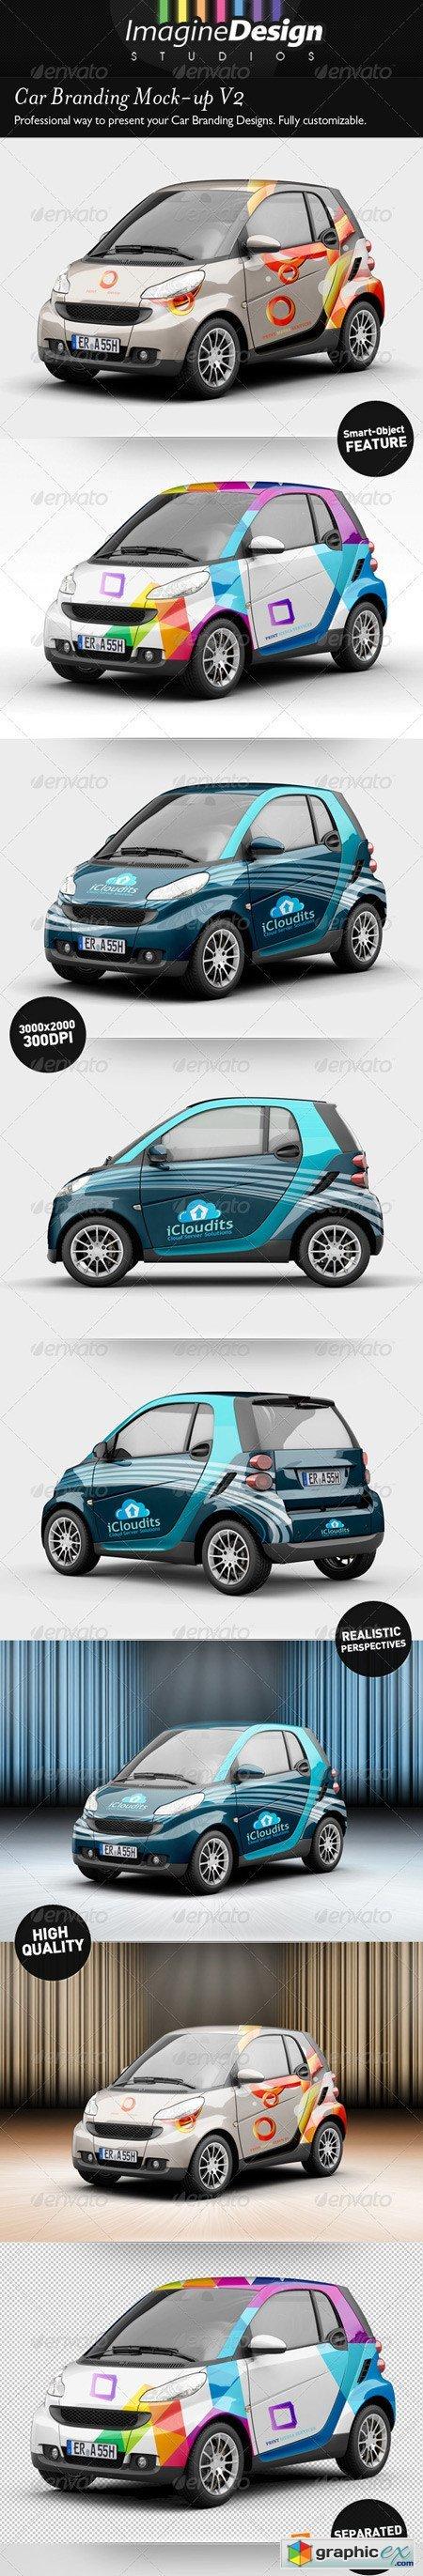 Car Branding Vector Car Branding Mock-up v2